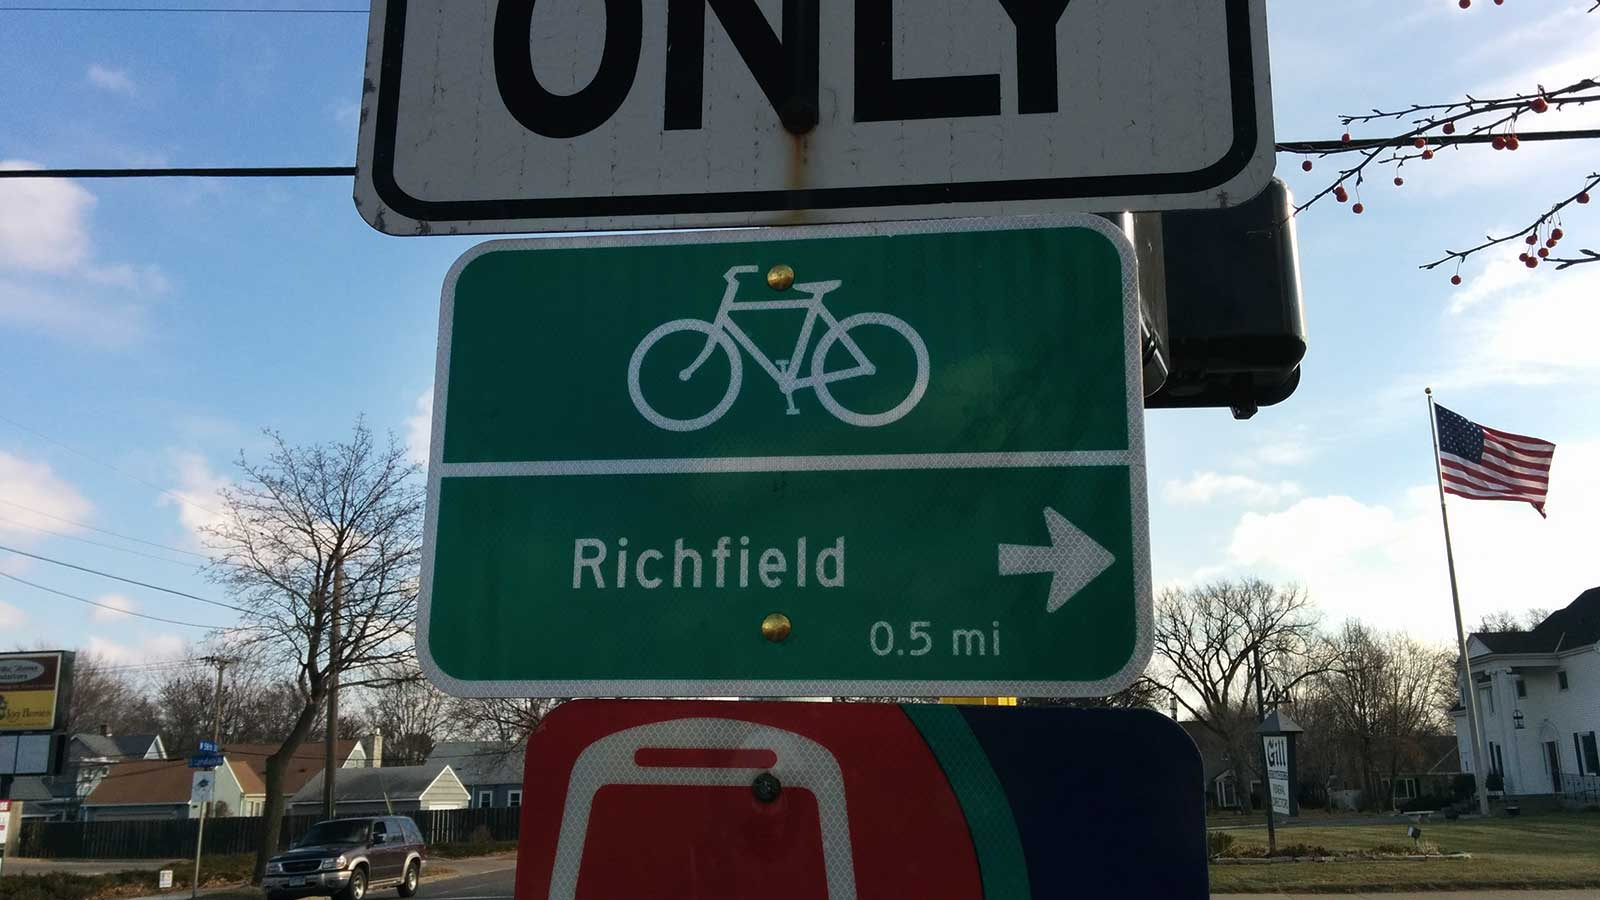 This way to Richfield